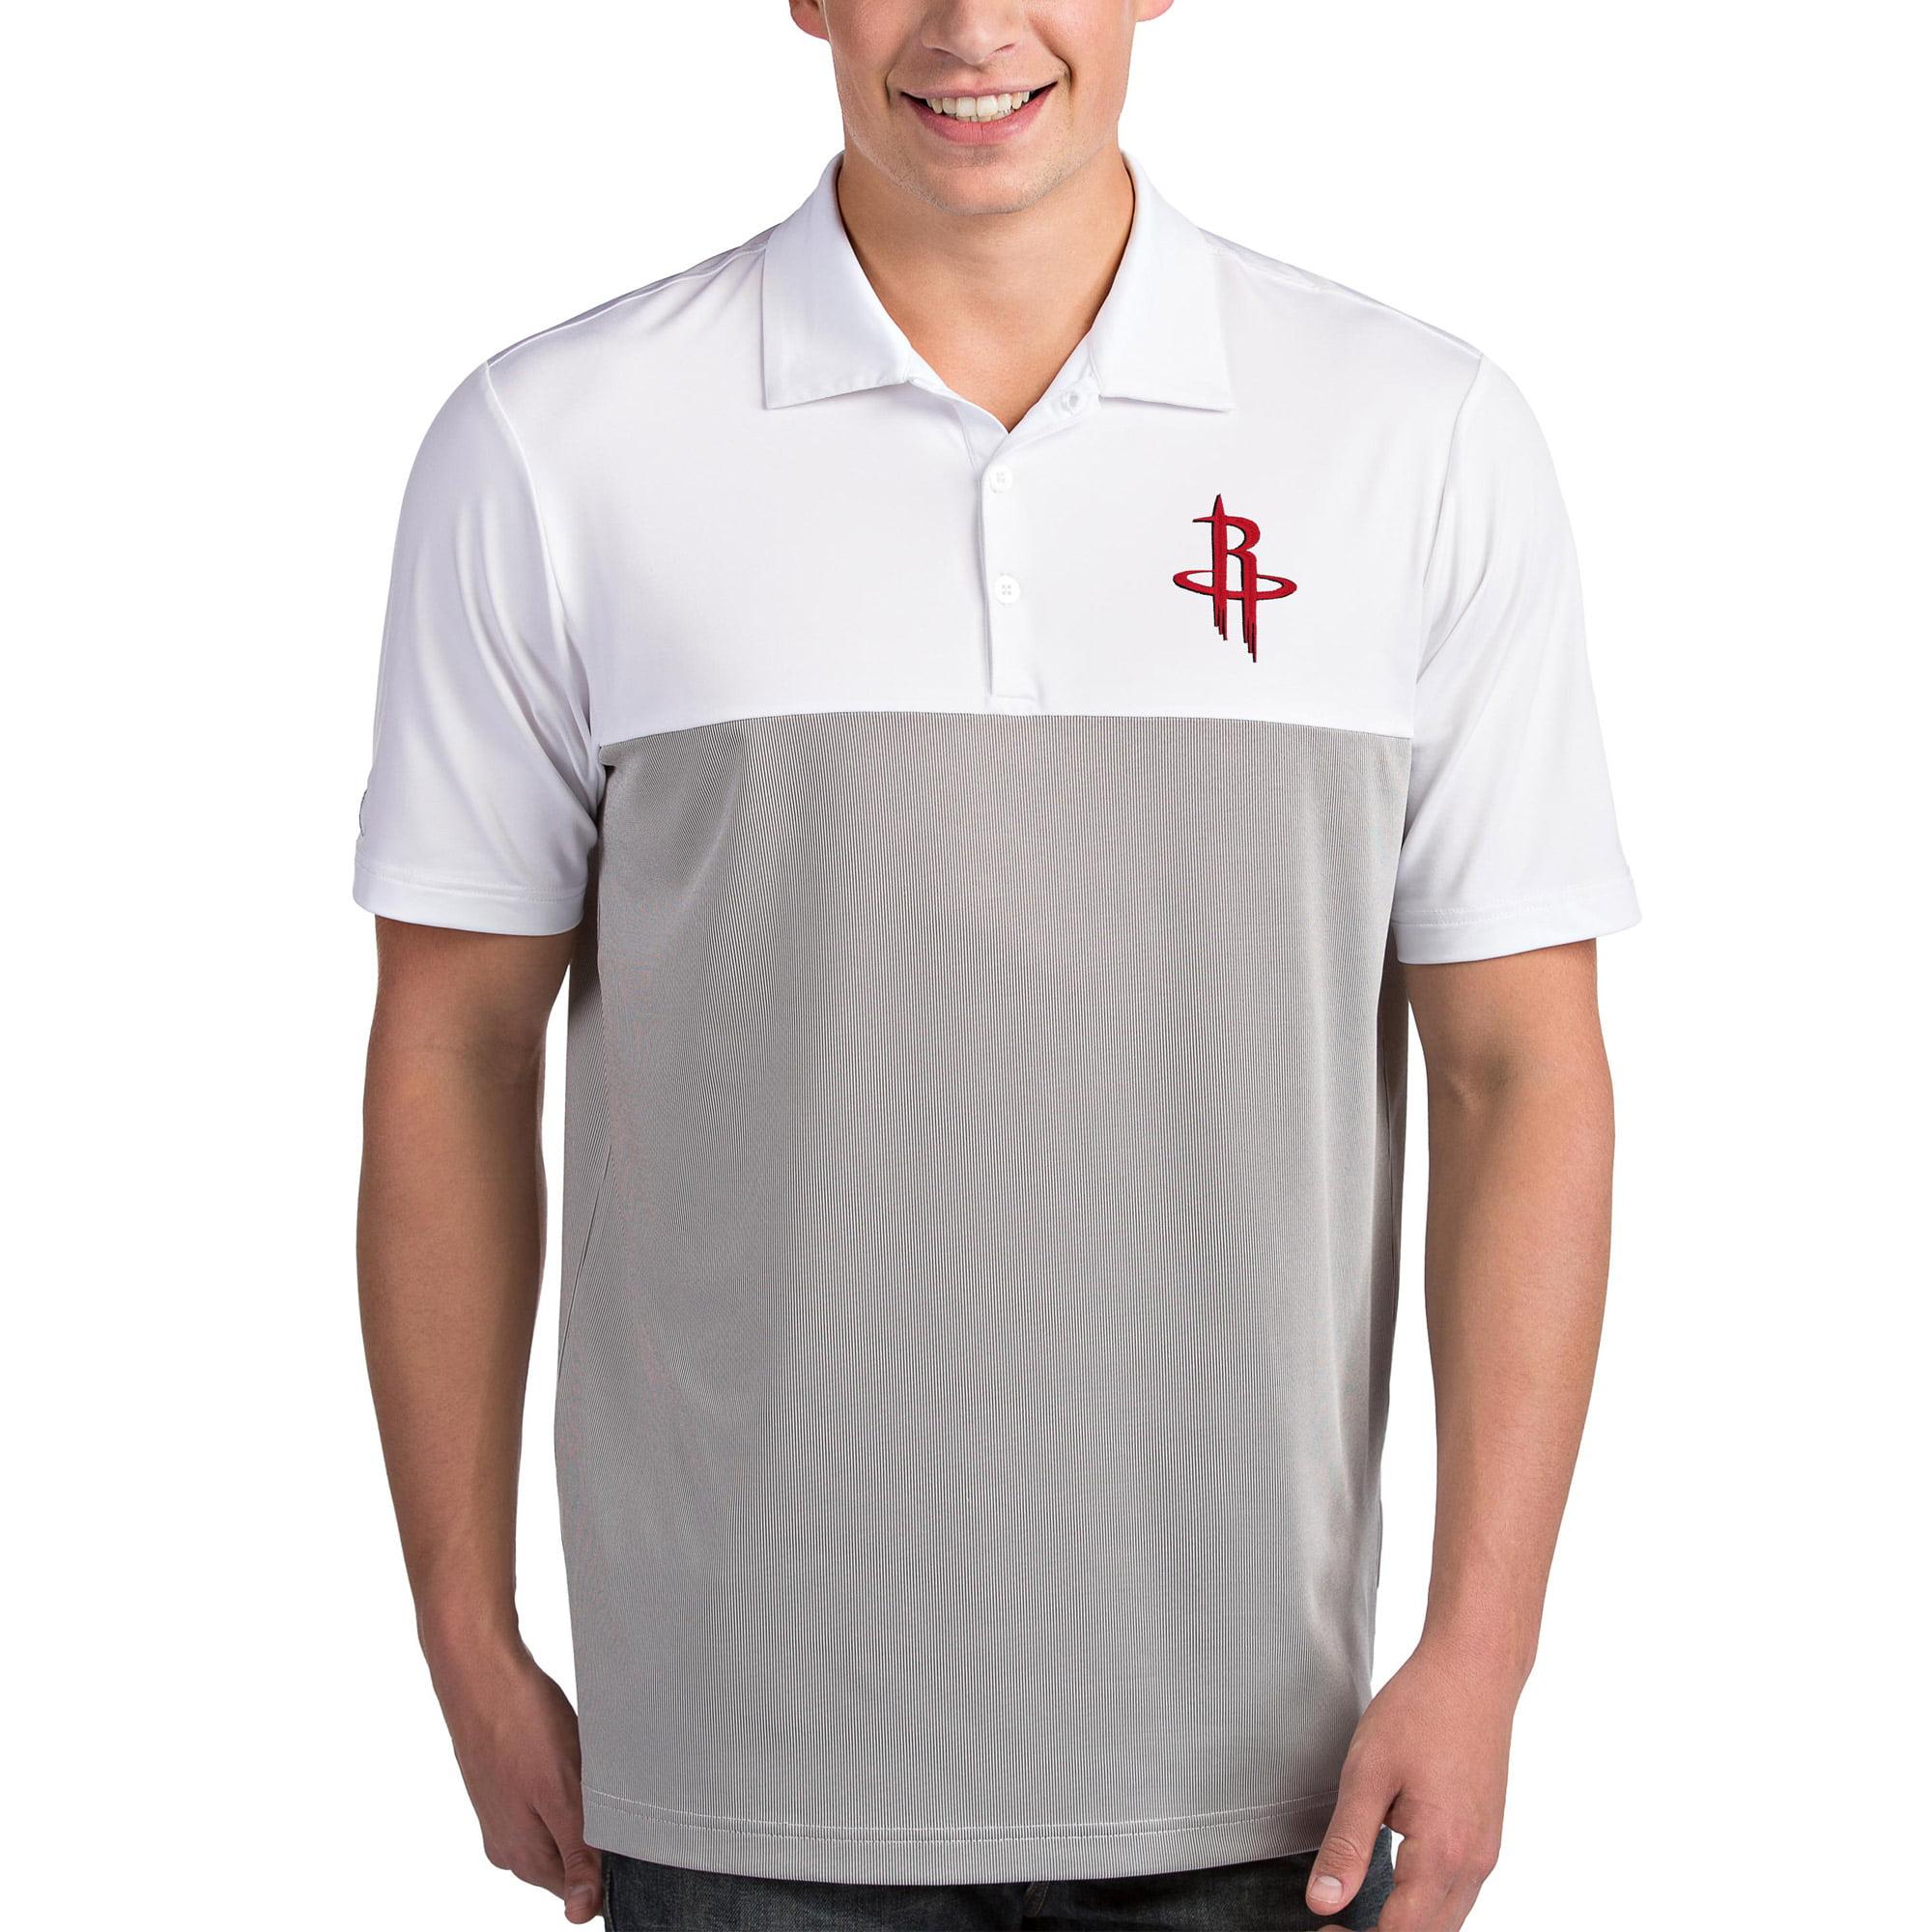 Houston Rockets Antigua Venture Polo - White/Gray